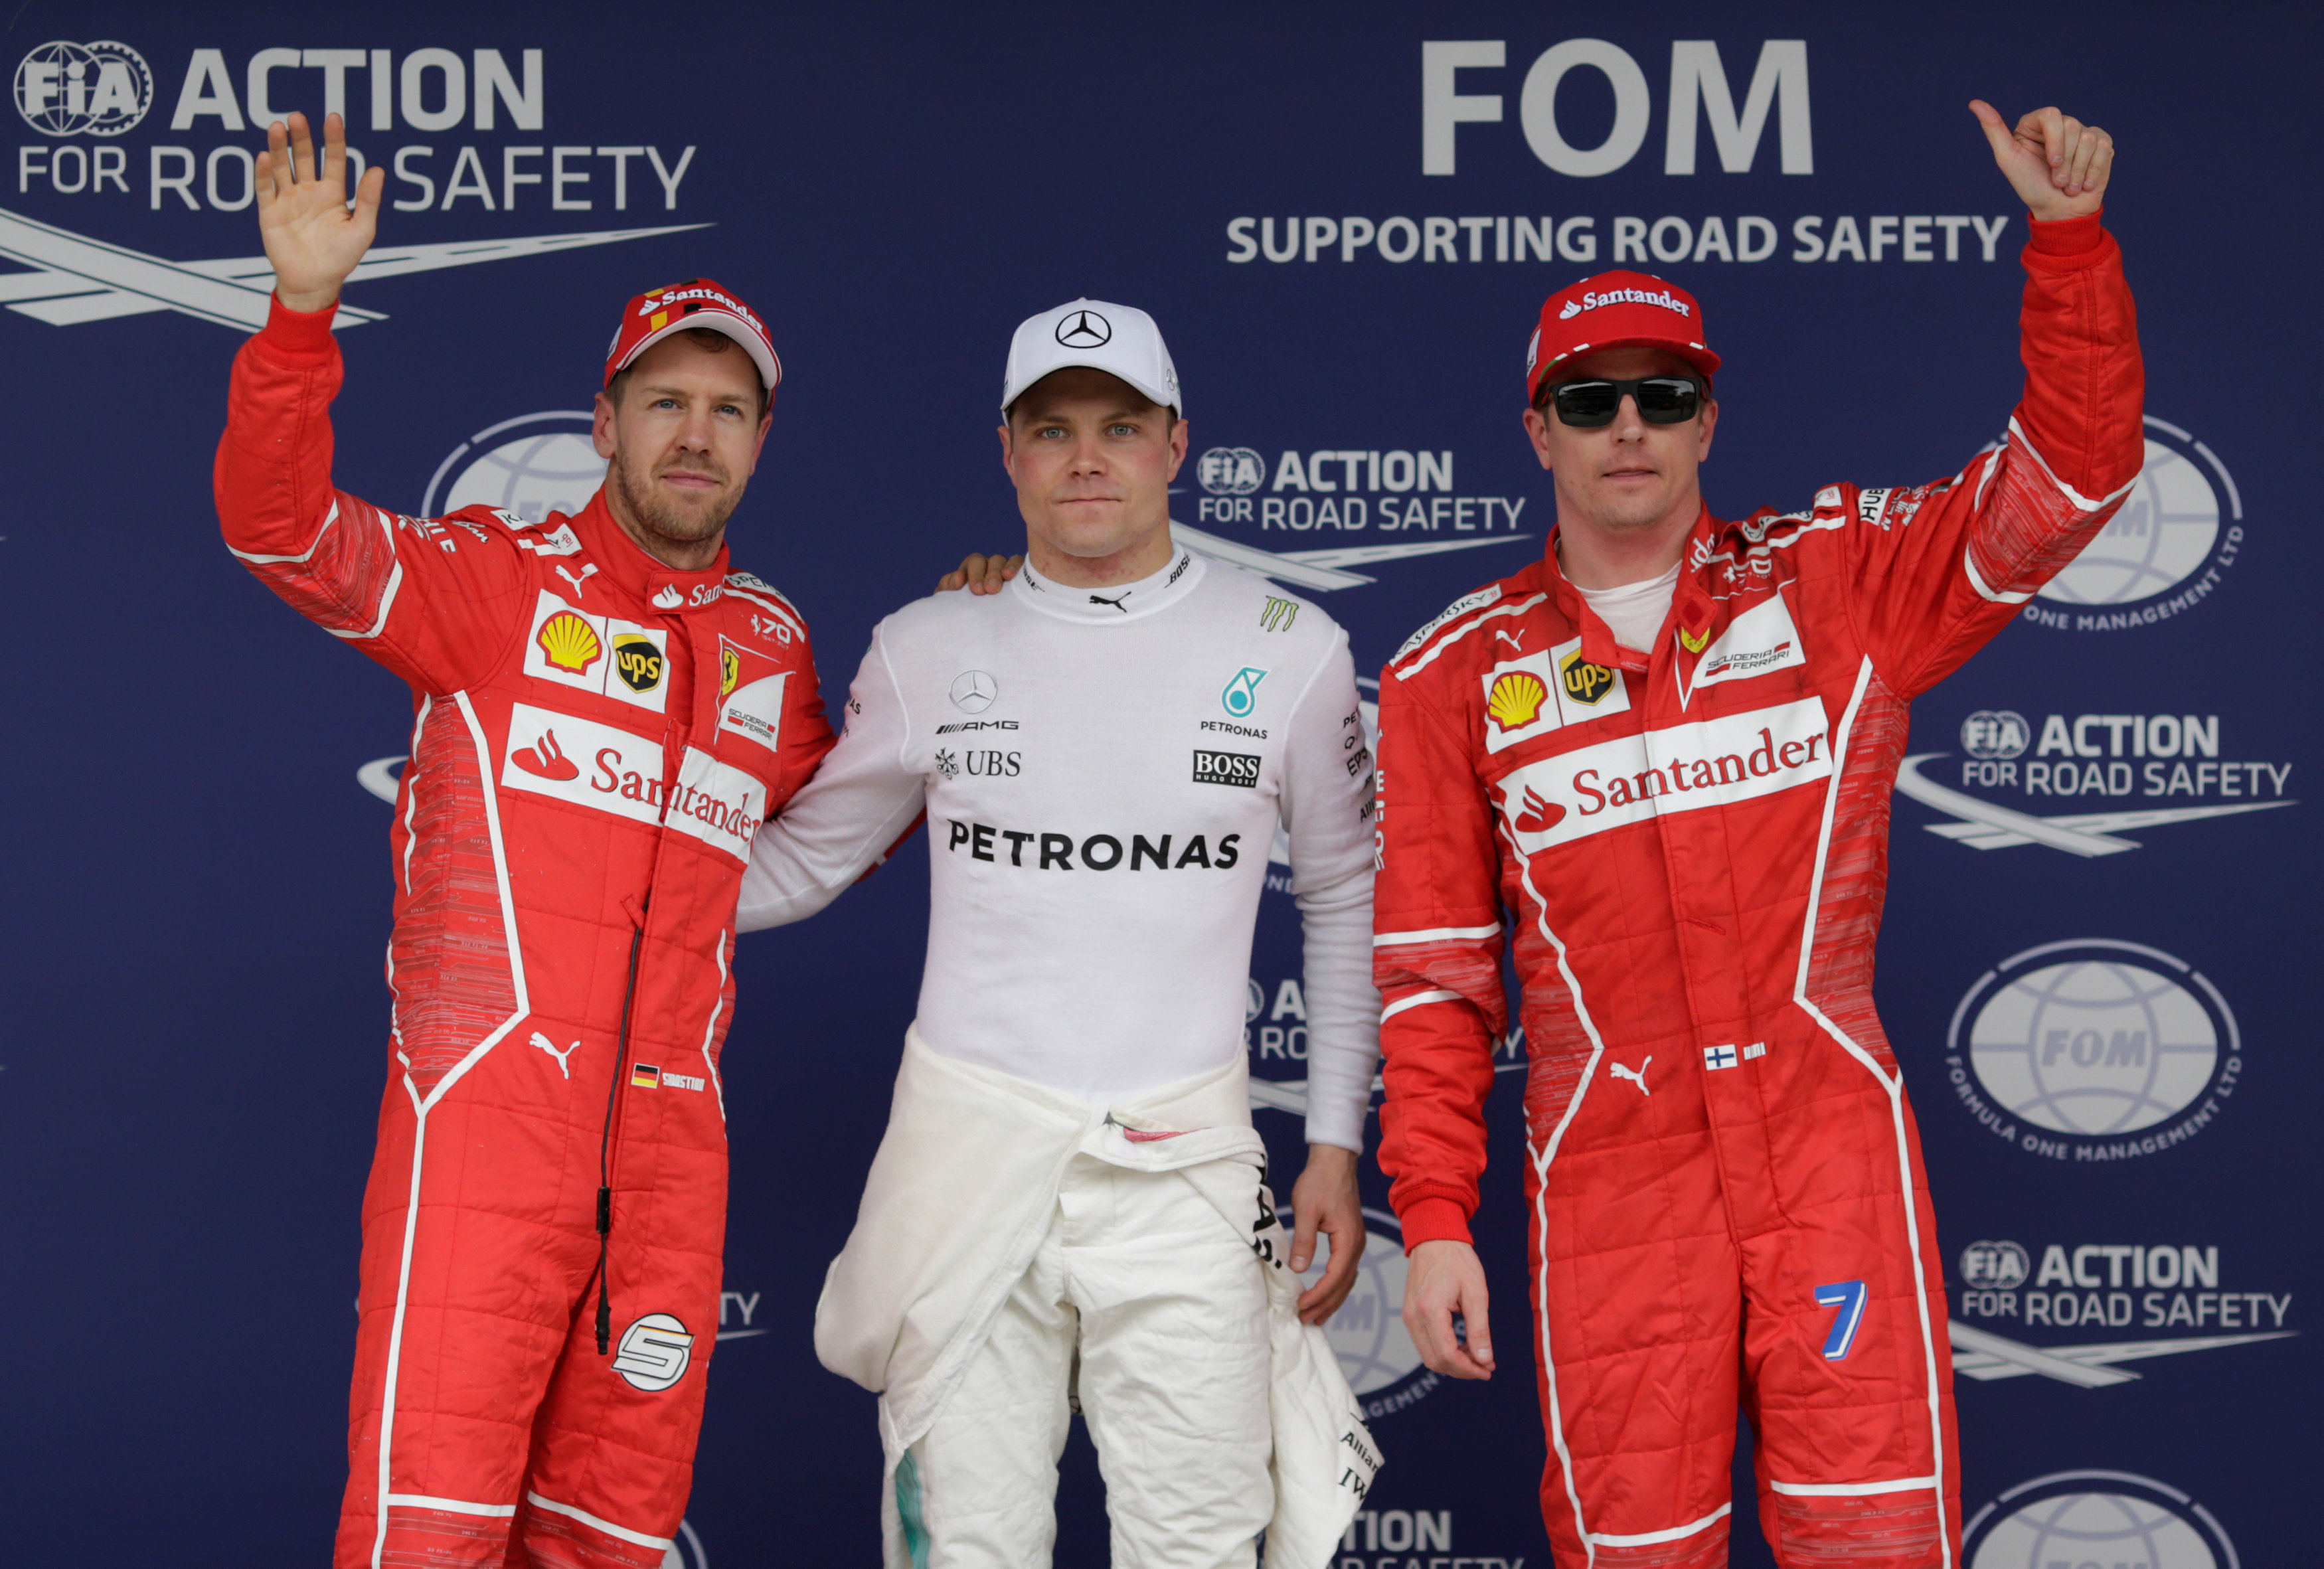 F1: Valtteri Bottas on pole after Lewis Hamilton crashes out